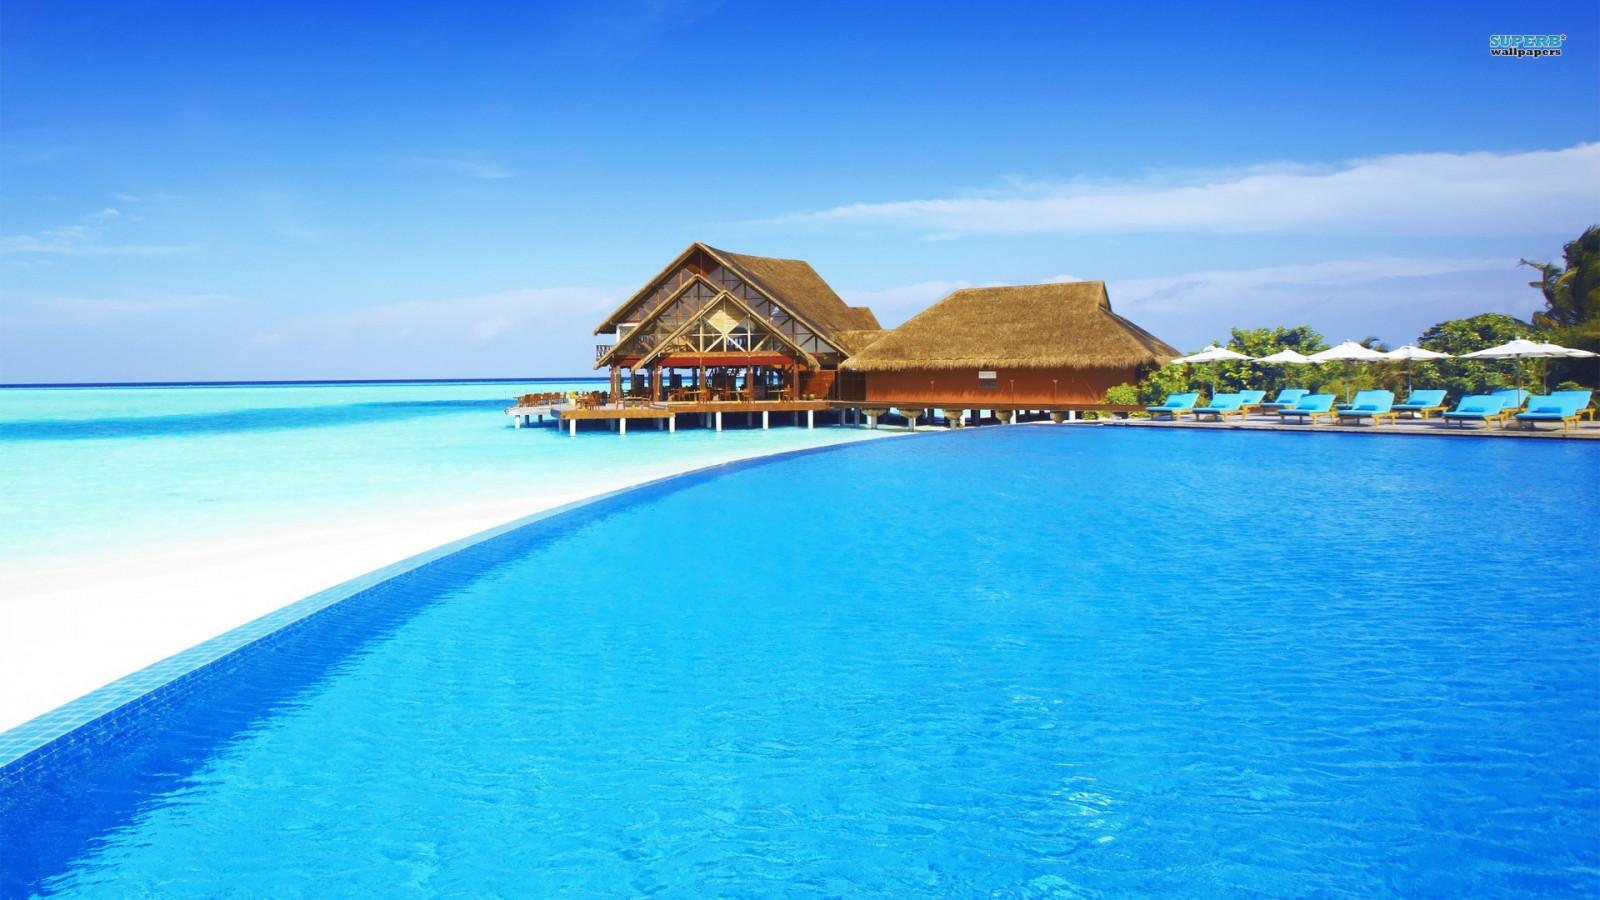 Disney's Caribbean Beach Resort Unofficial Fan Site Caribbean beach pool pictures